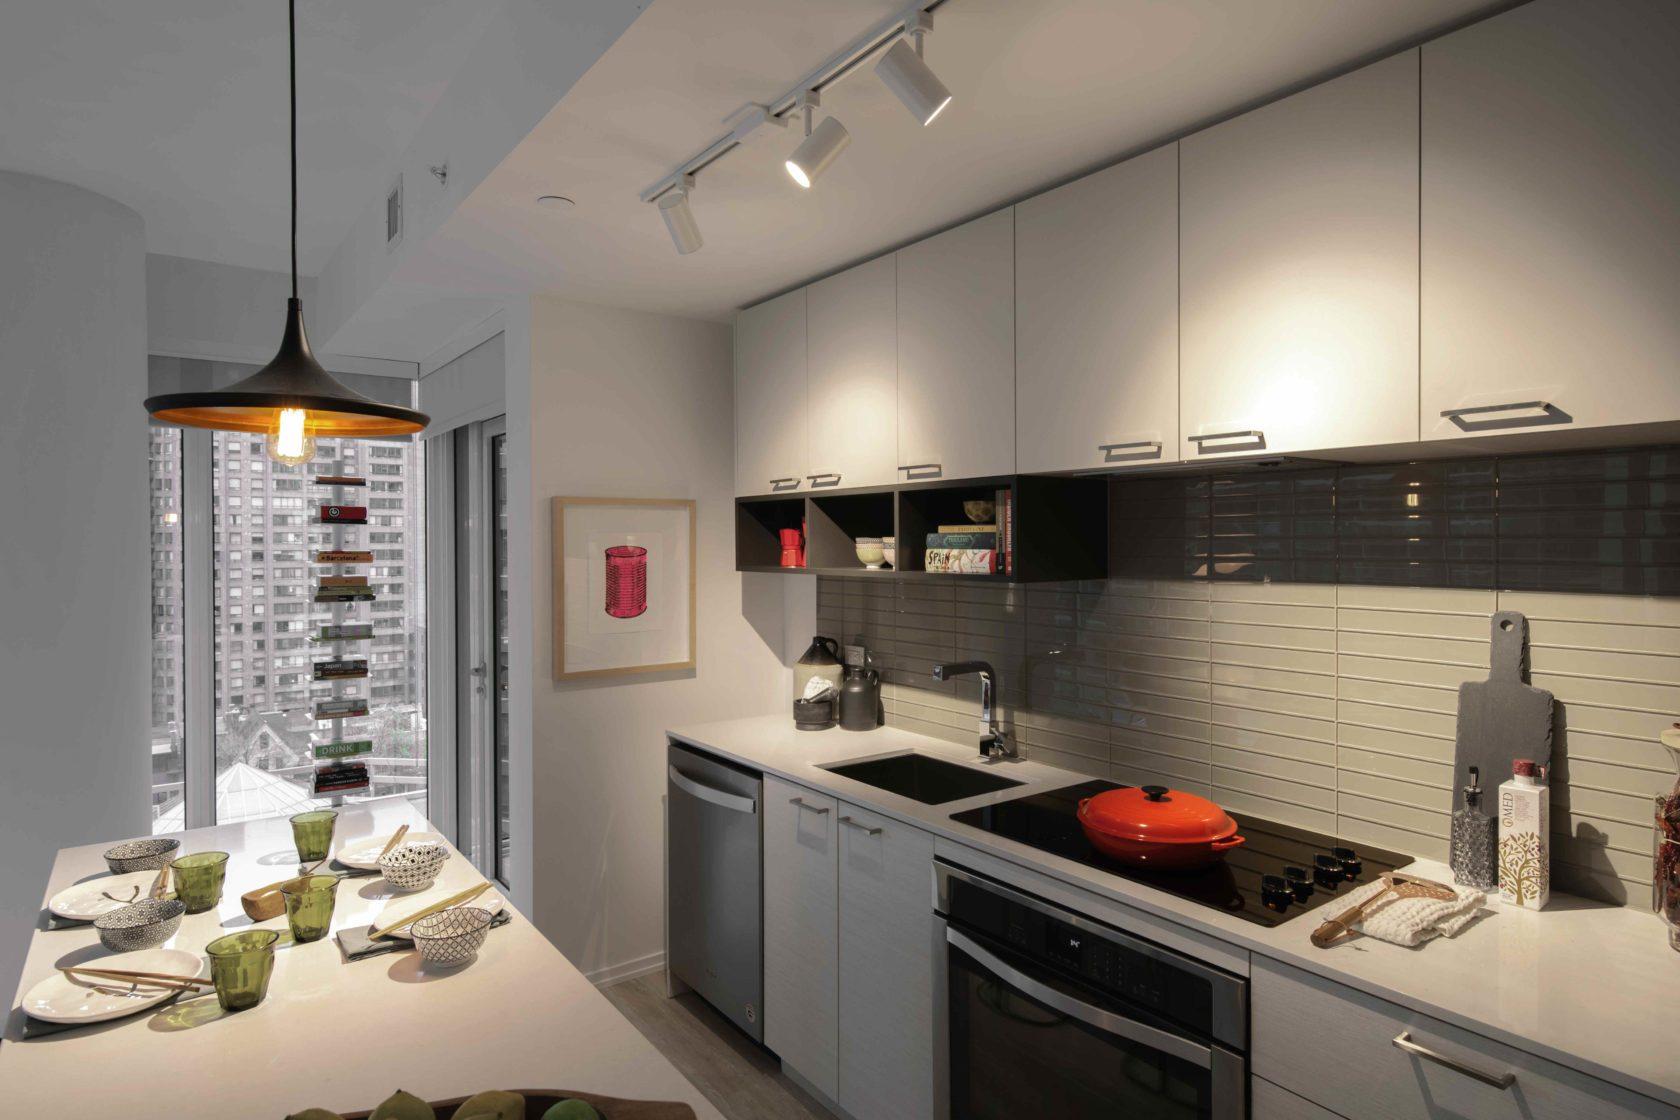 Livmore Suite kitchen space